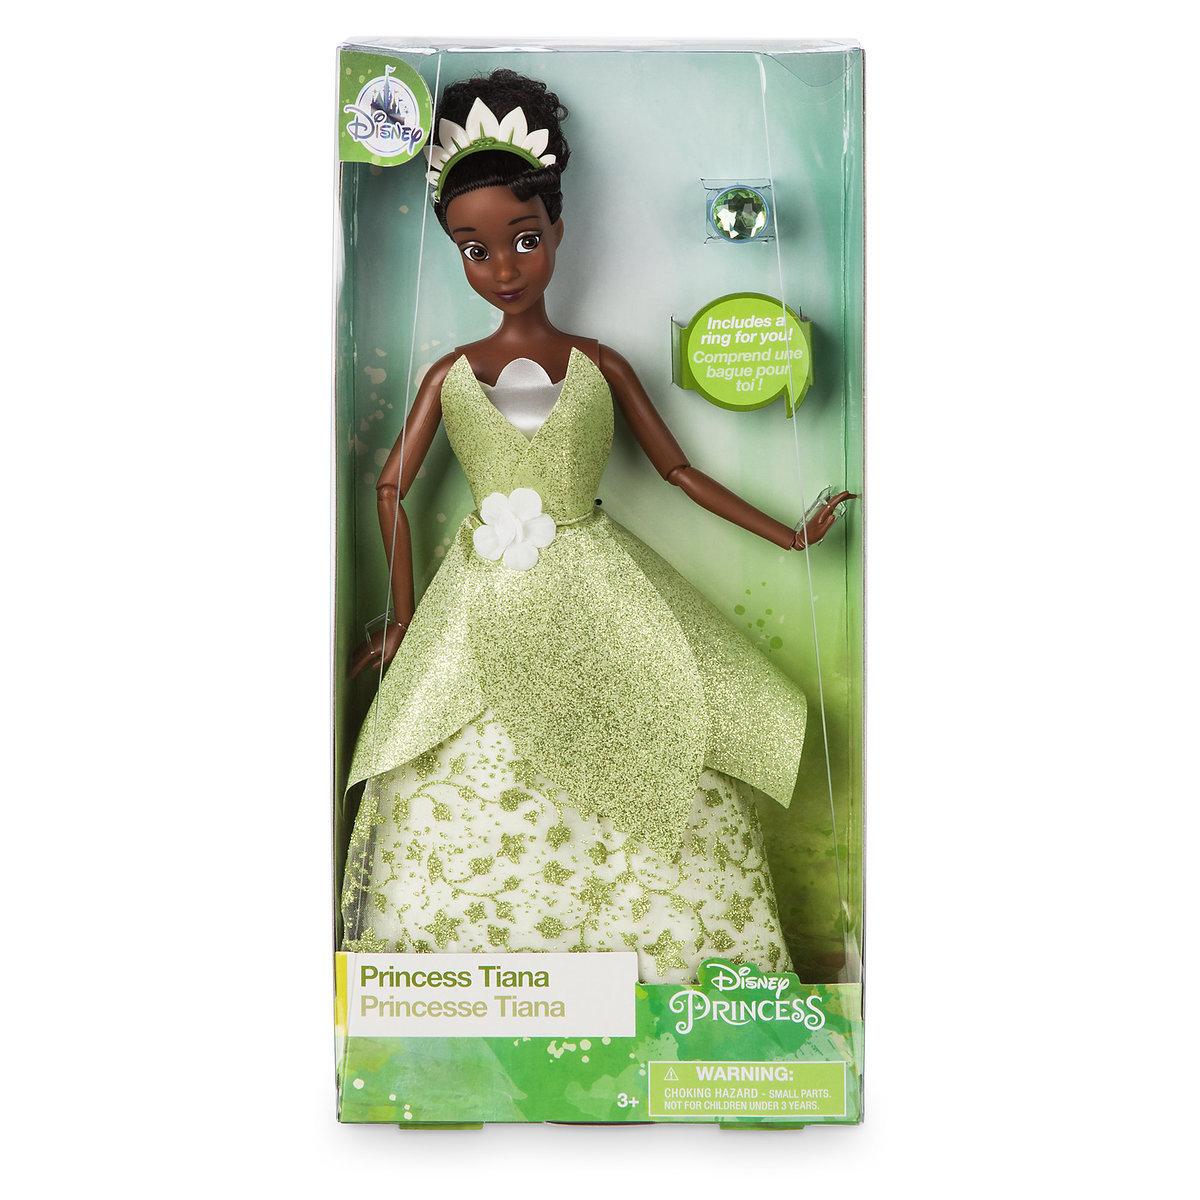 Tiana Classic Doll with Ring - The Princess and the Frog - 12'' ของแท้ นำเข้าจากอเมริกา